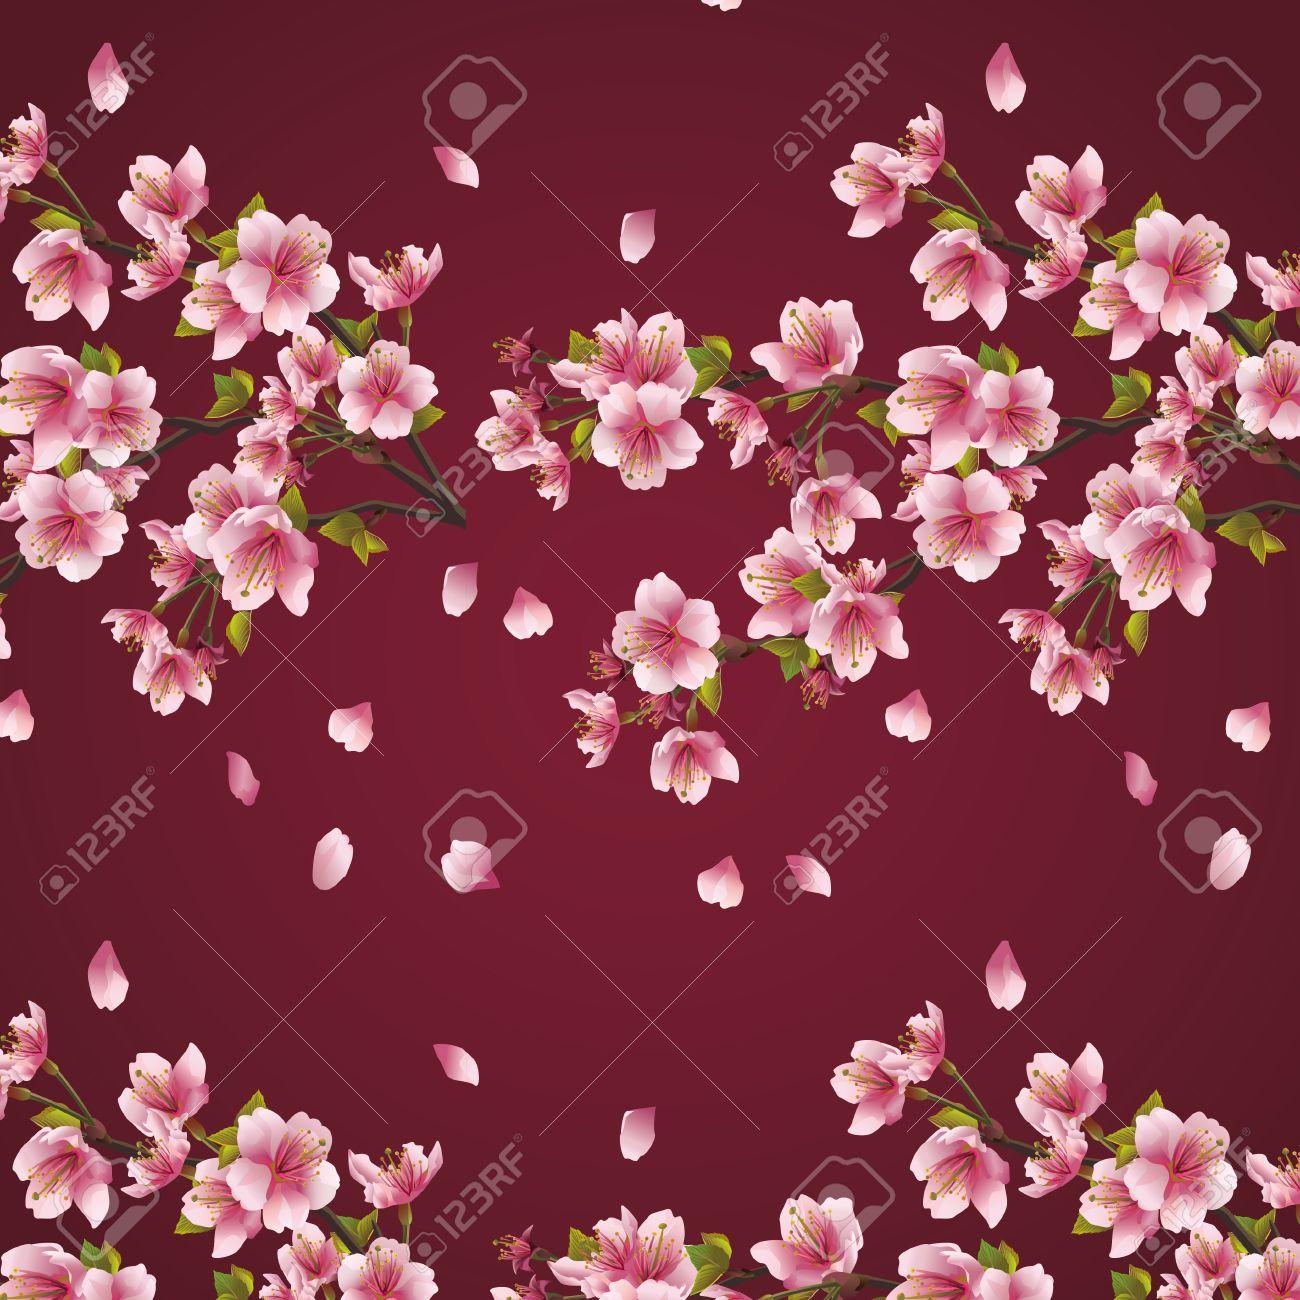 Maroon Blossom